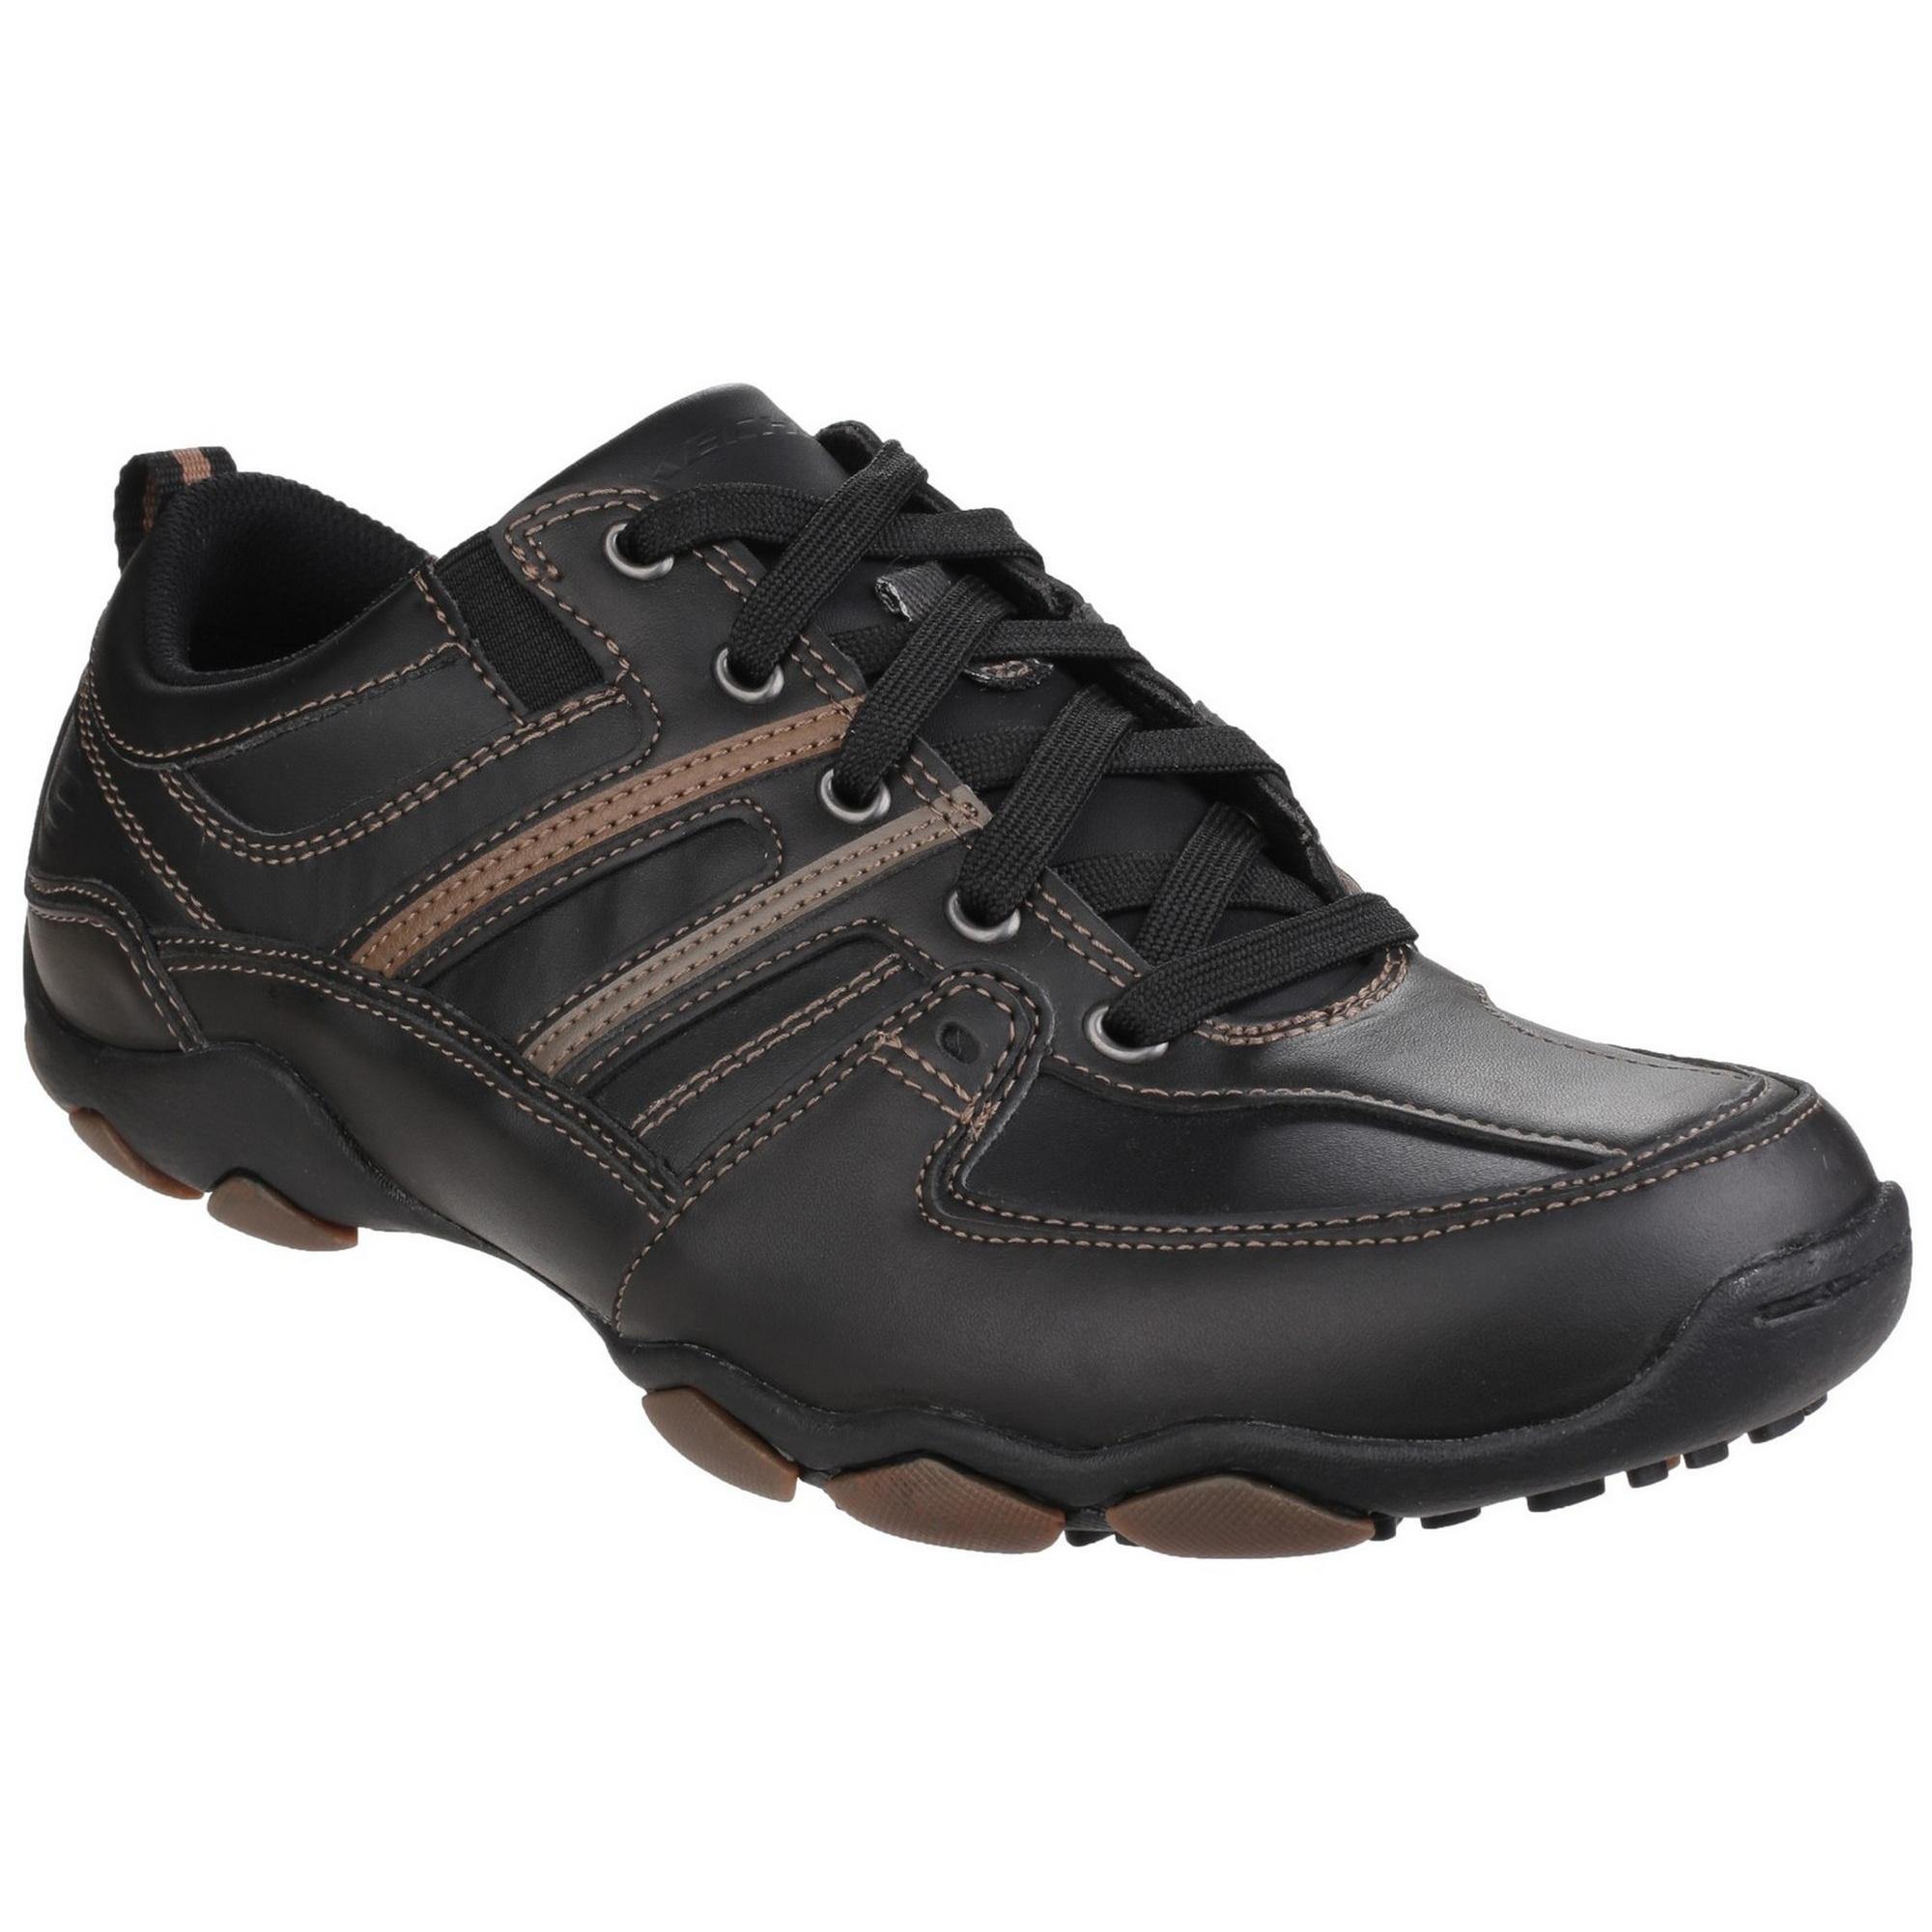 Skechers Herren Schuhe Diameter Selent Relaxed Fit Schuhe Herren (FS4014) 4c58f0